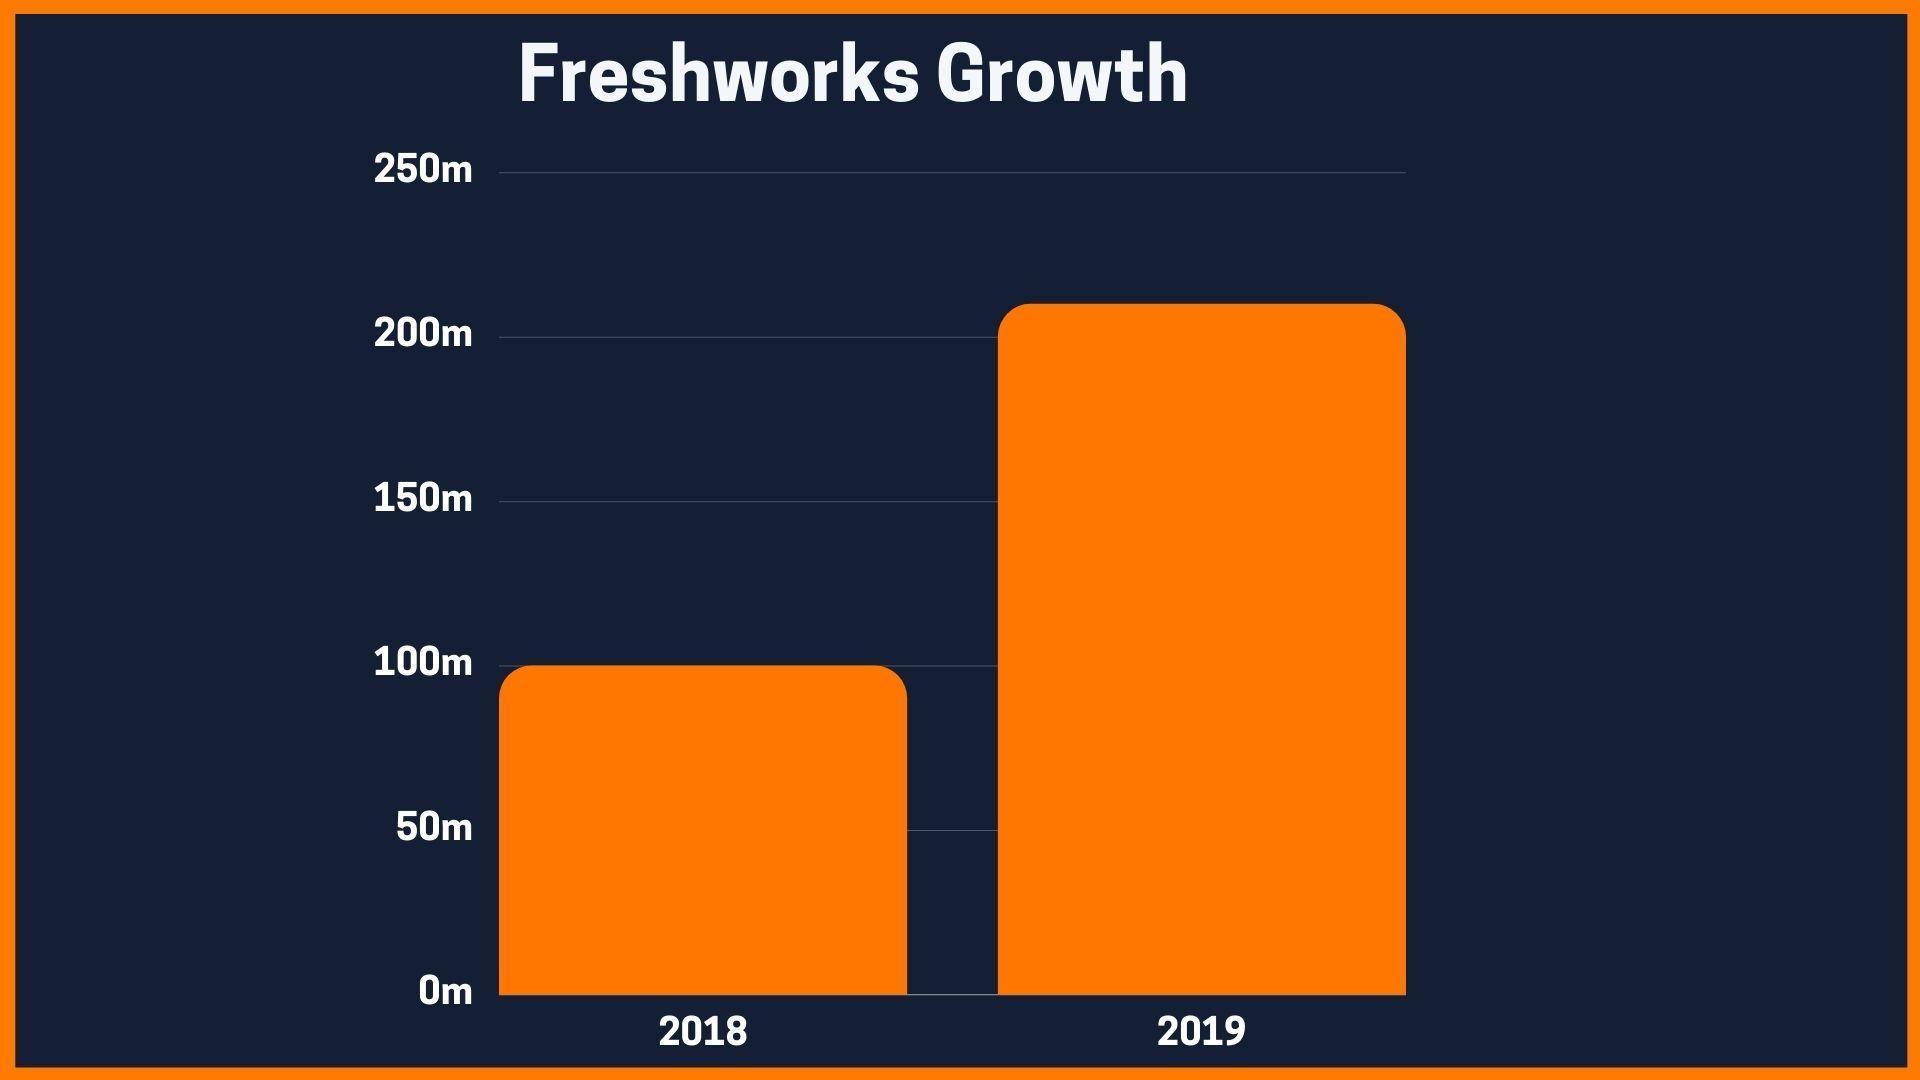 Freshwork's Growth